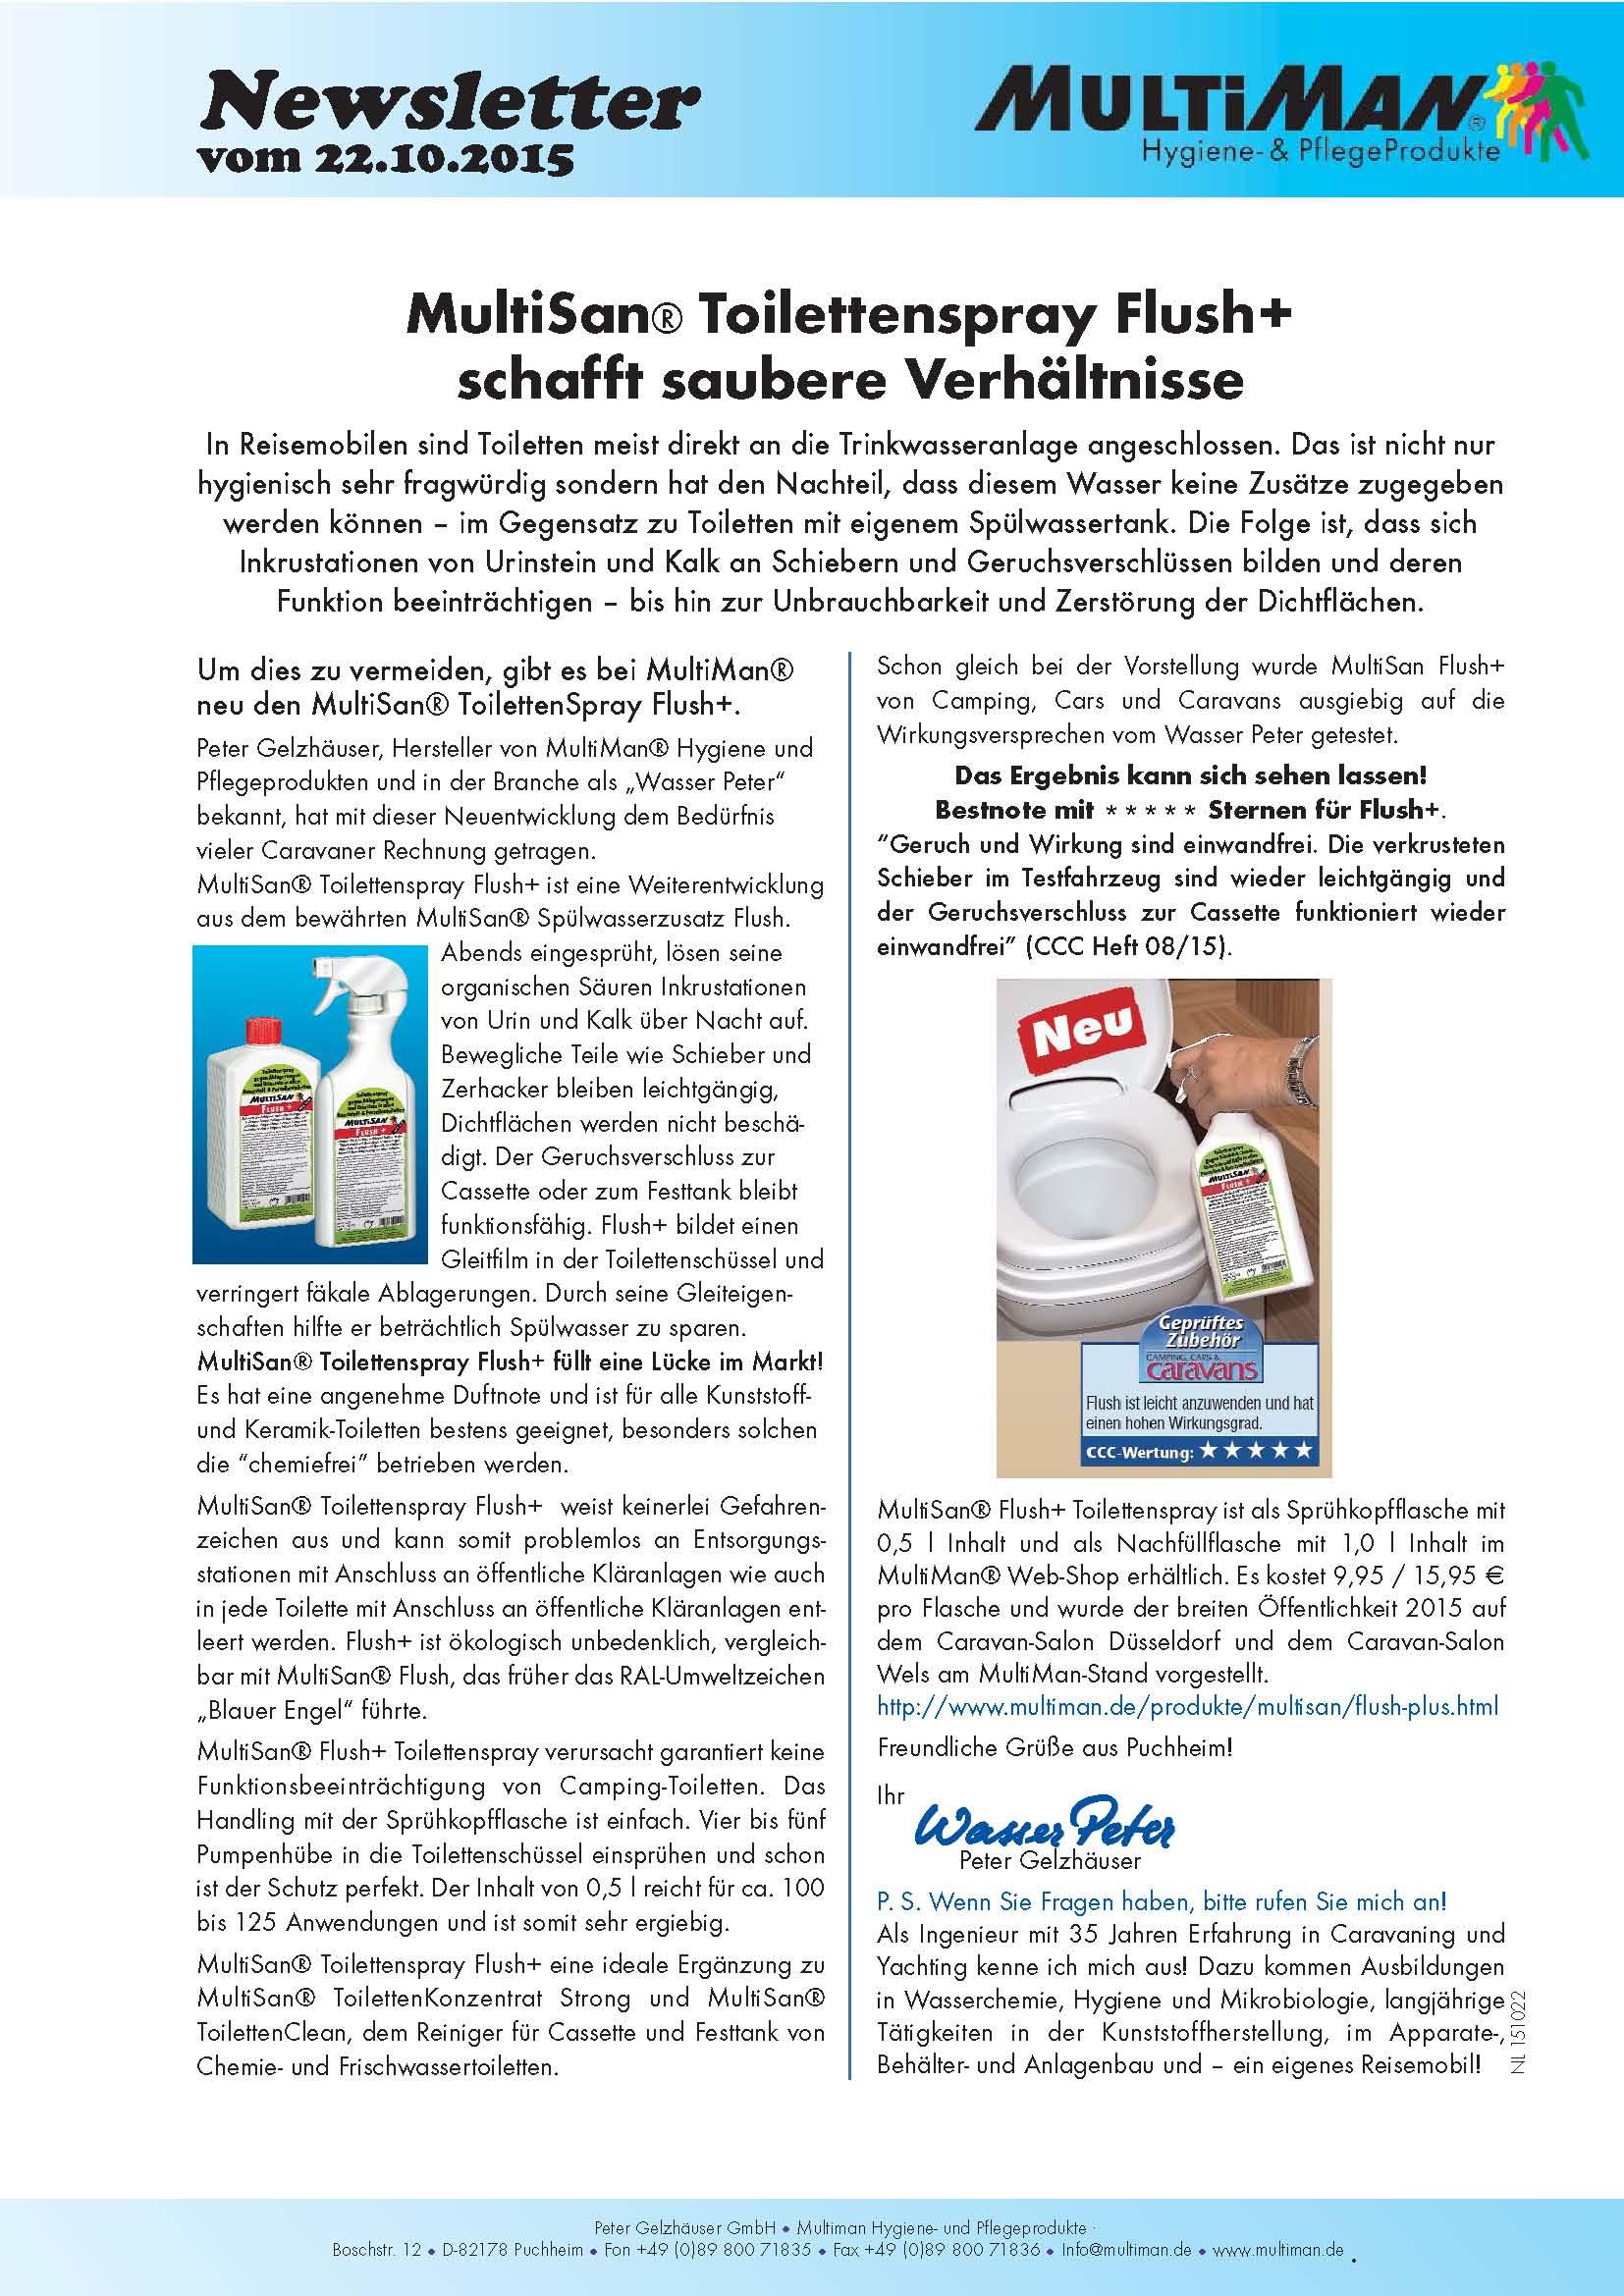 NL-15-07_Flush-Plus-Neu-151022